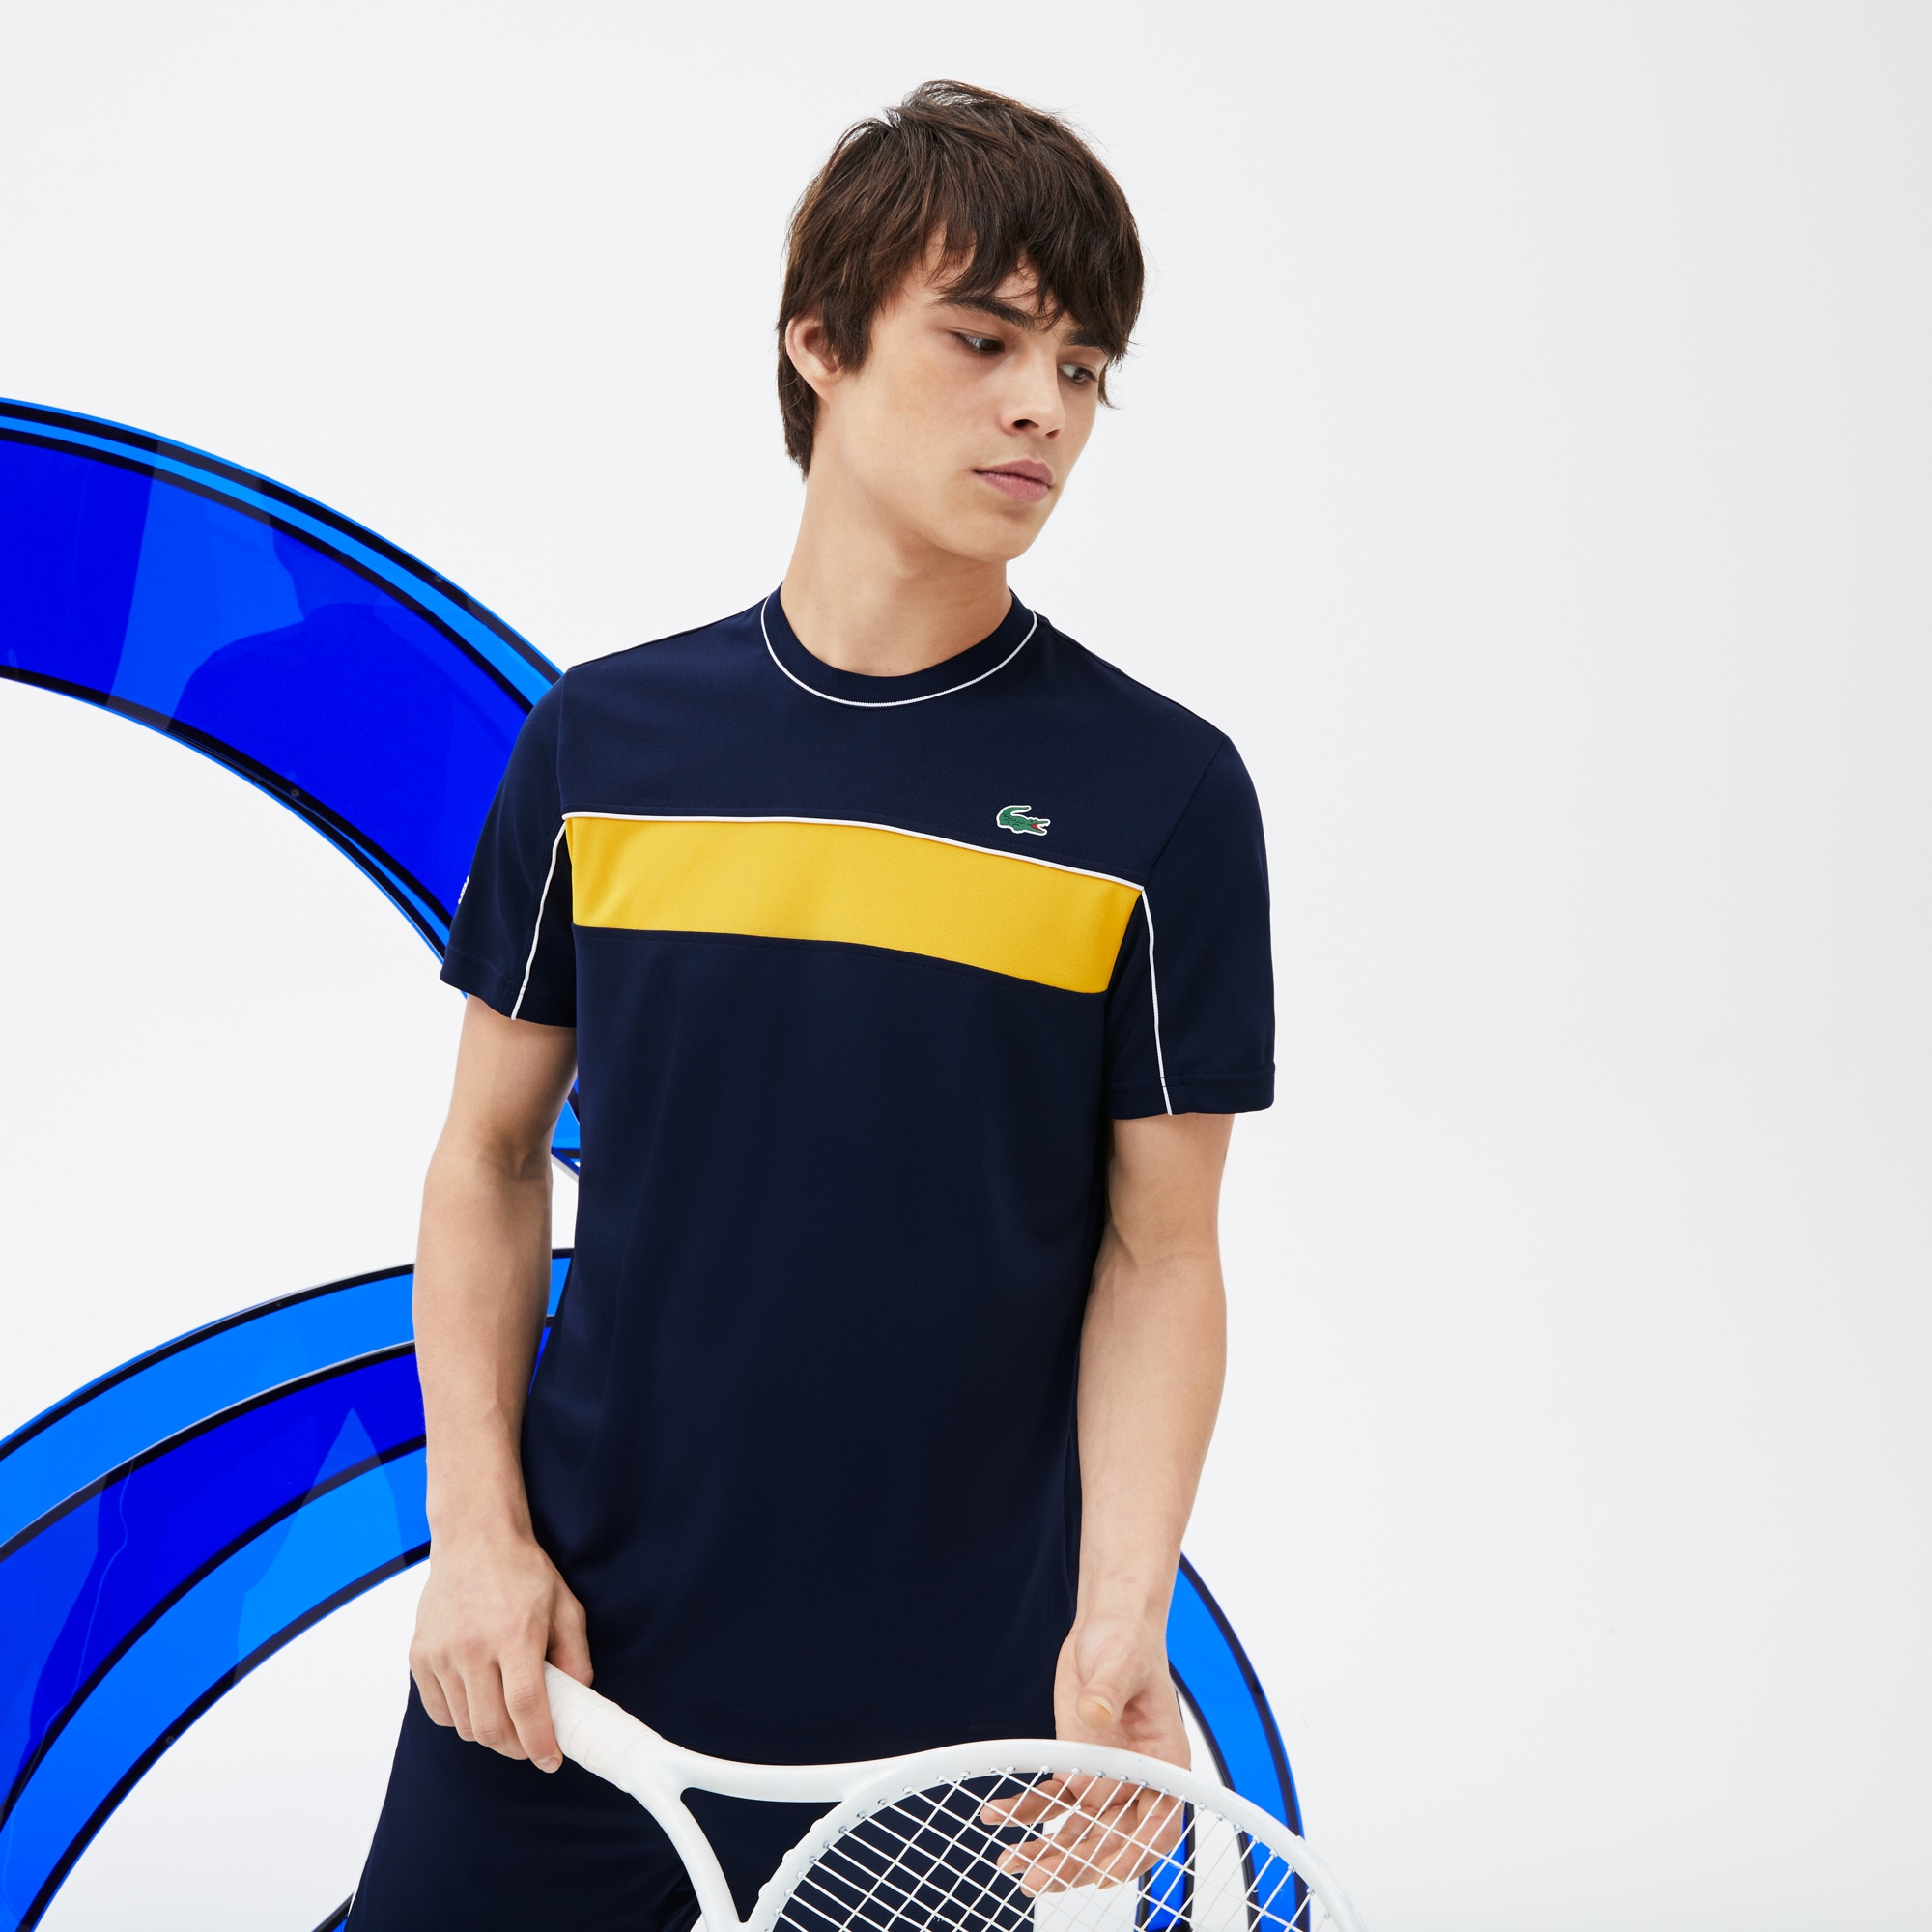 Men's SPORT Tech Piqué T-Shirt - Novak Djokovic Collection